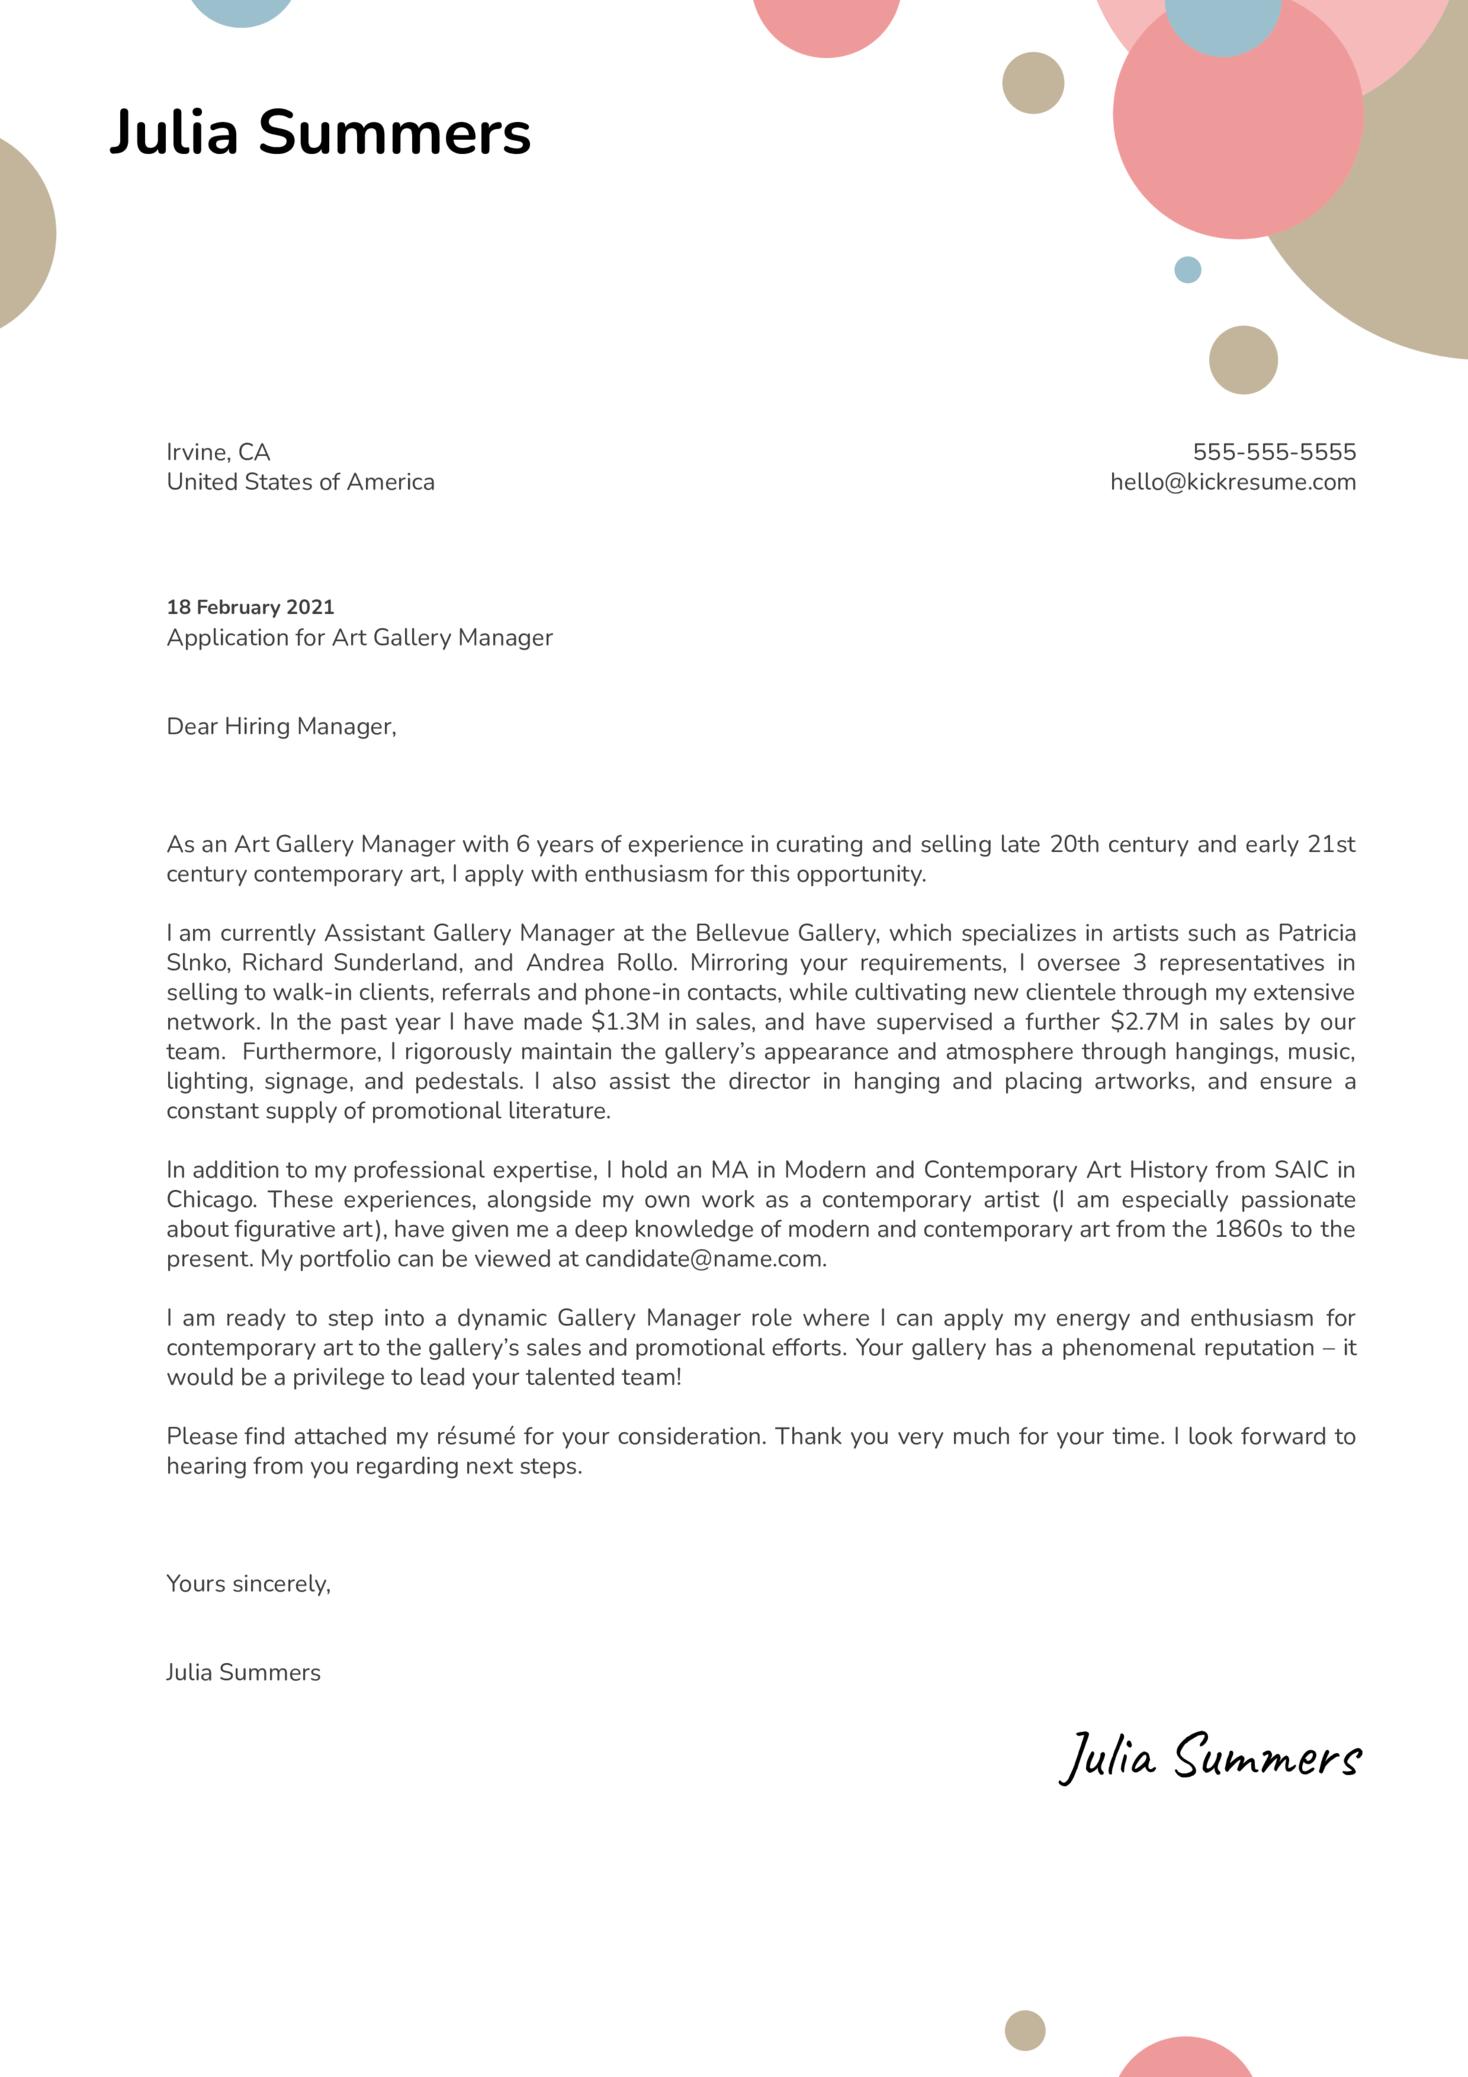 Art Gallery Manager Cover Letter Sample